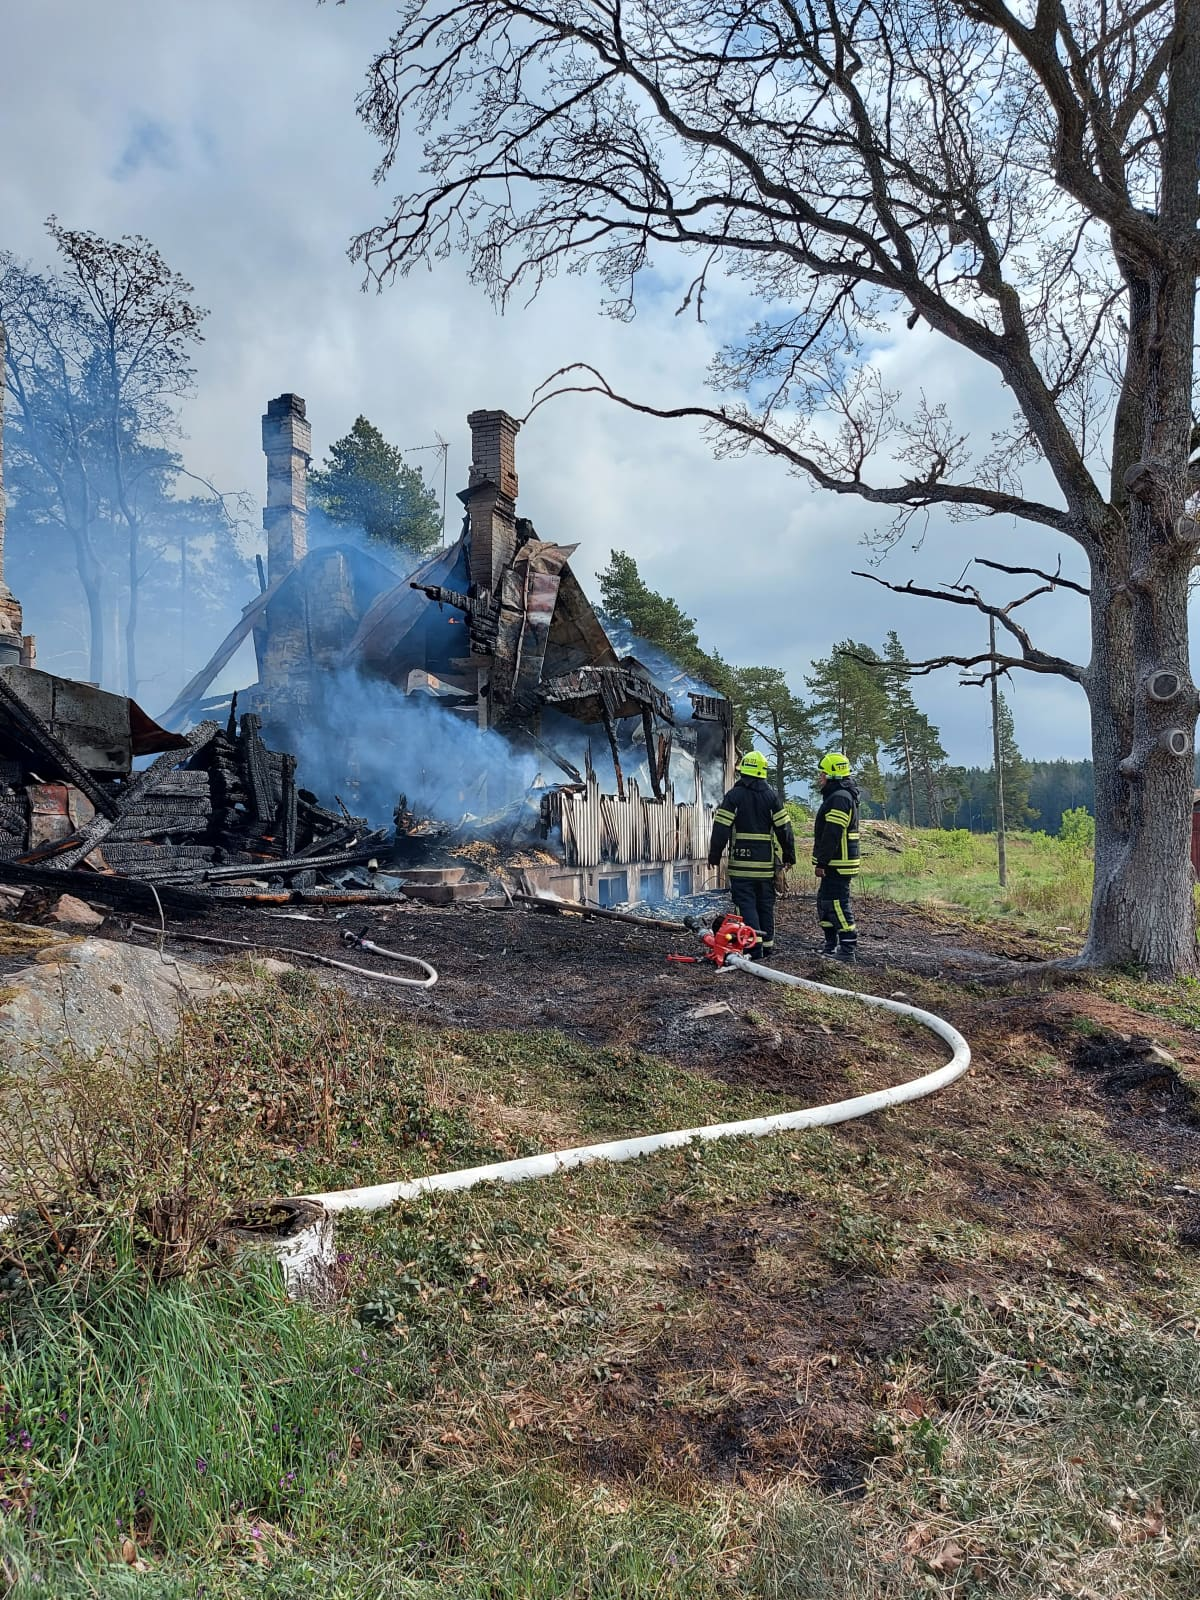 Grandvik Södergårdin kartano Paraisilla tuhoutui tulipalossa 15.5.2021